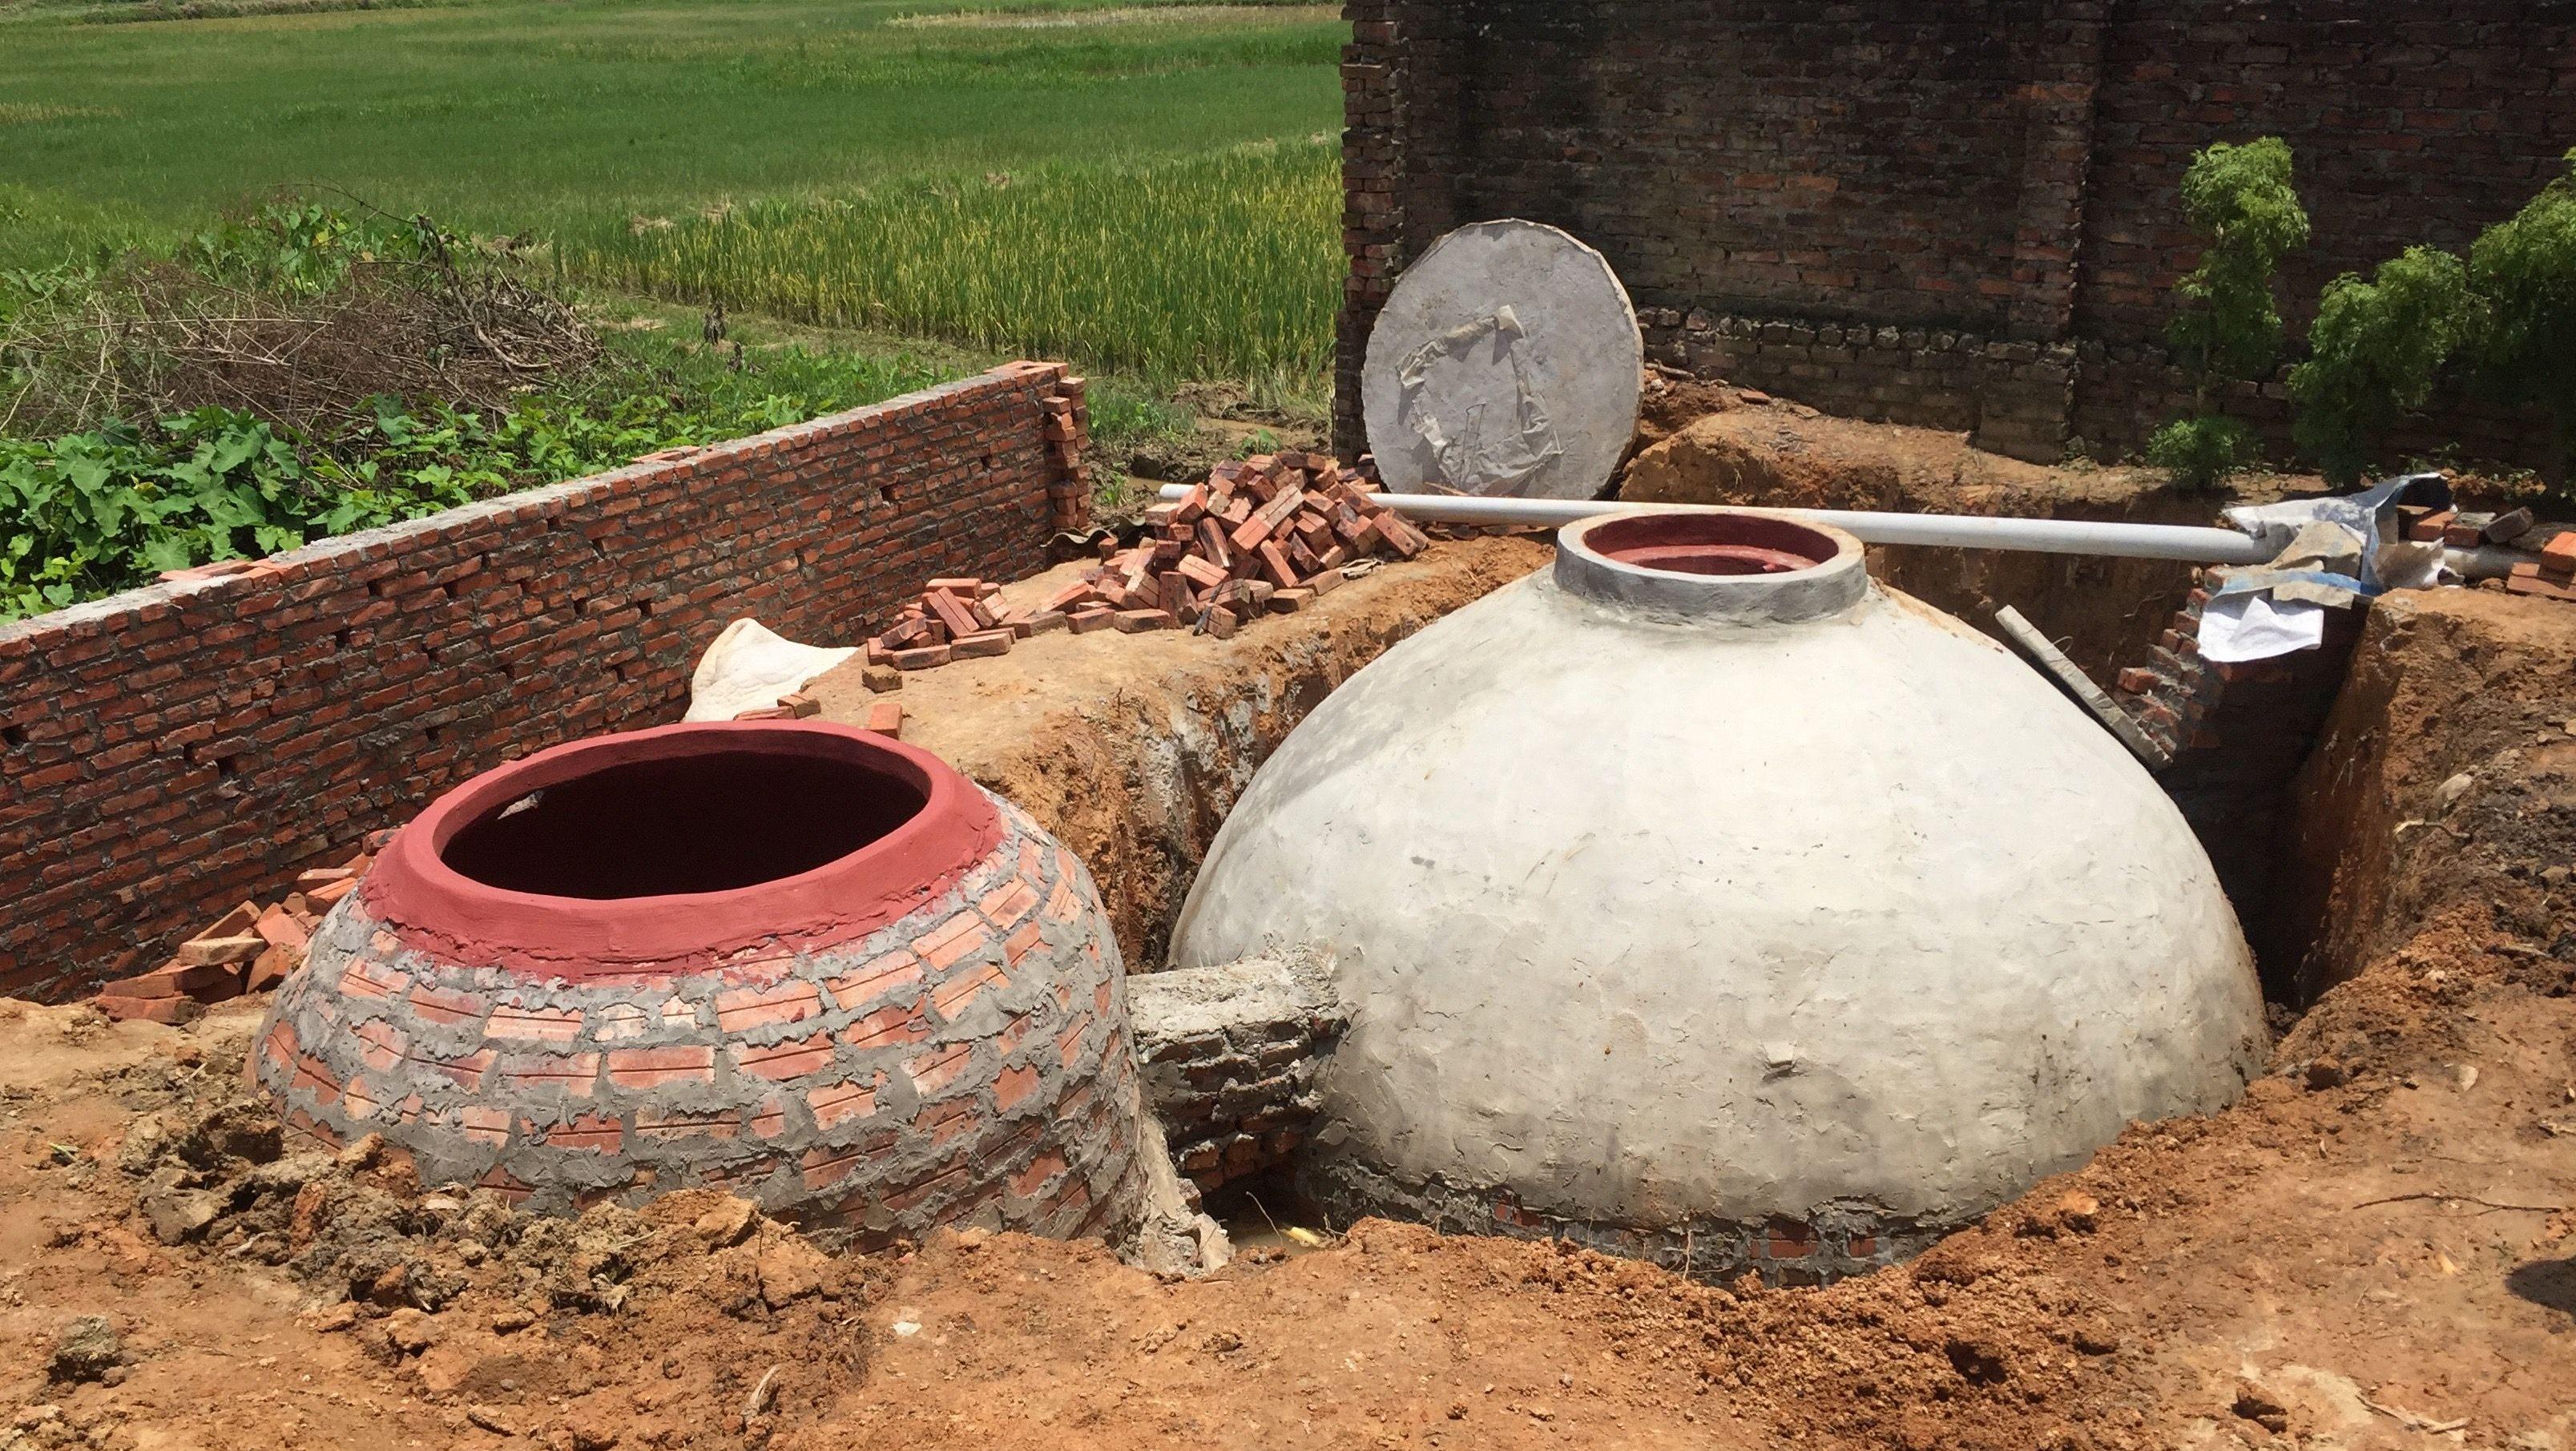 Two recently-built digesters in Hanoi, Vietnam.